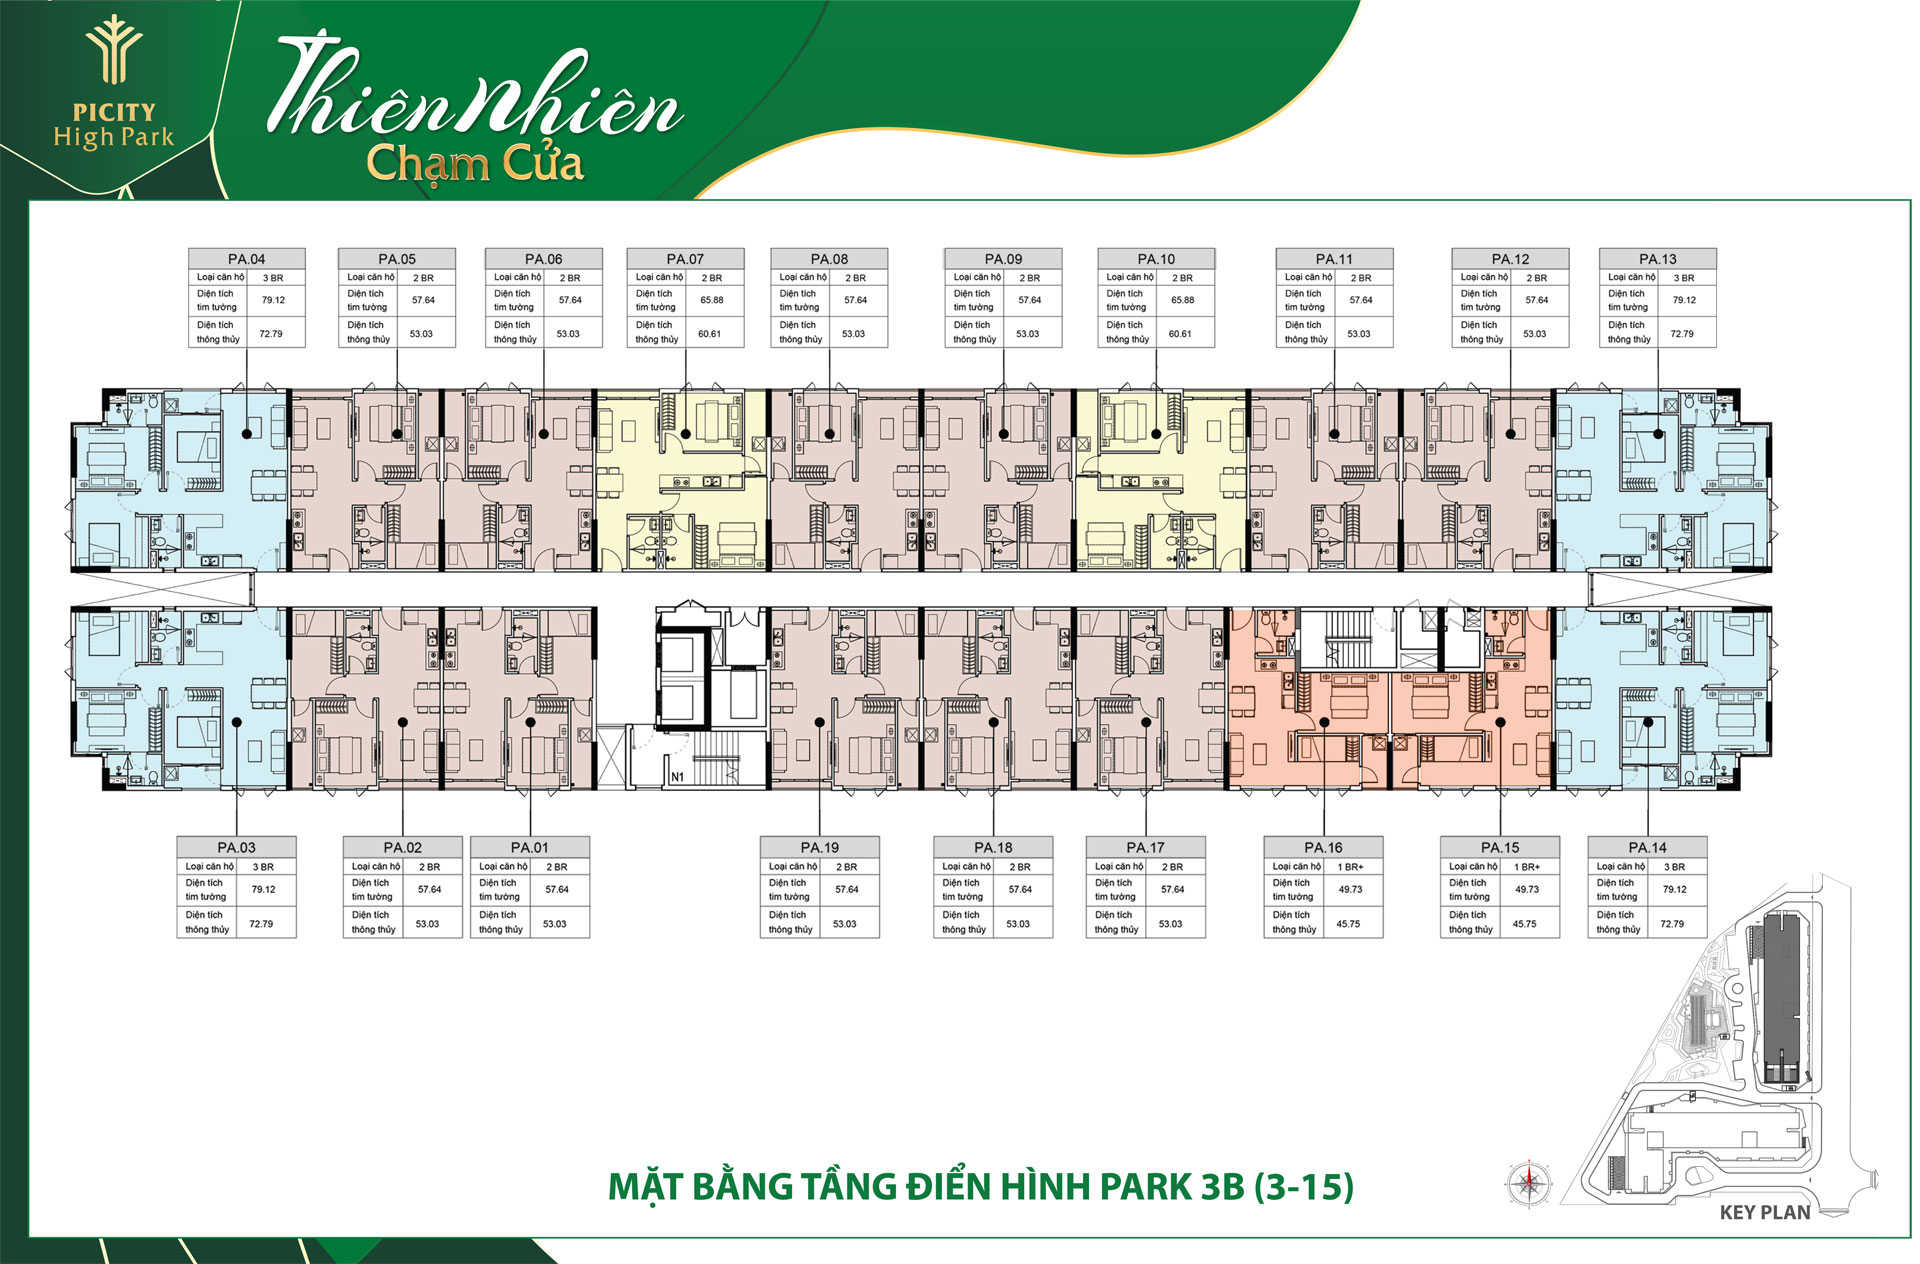 mat bang tang block park 3B picity high park 2020 - PICITY HIGH PARK QUẬN 12